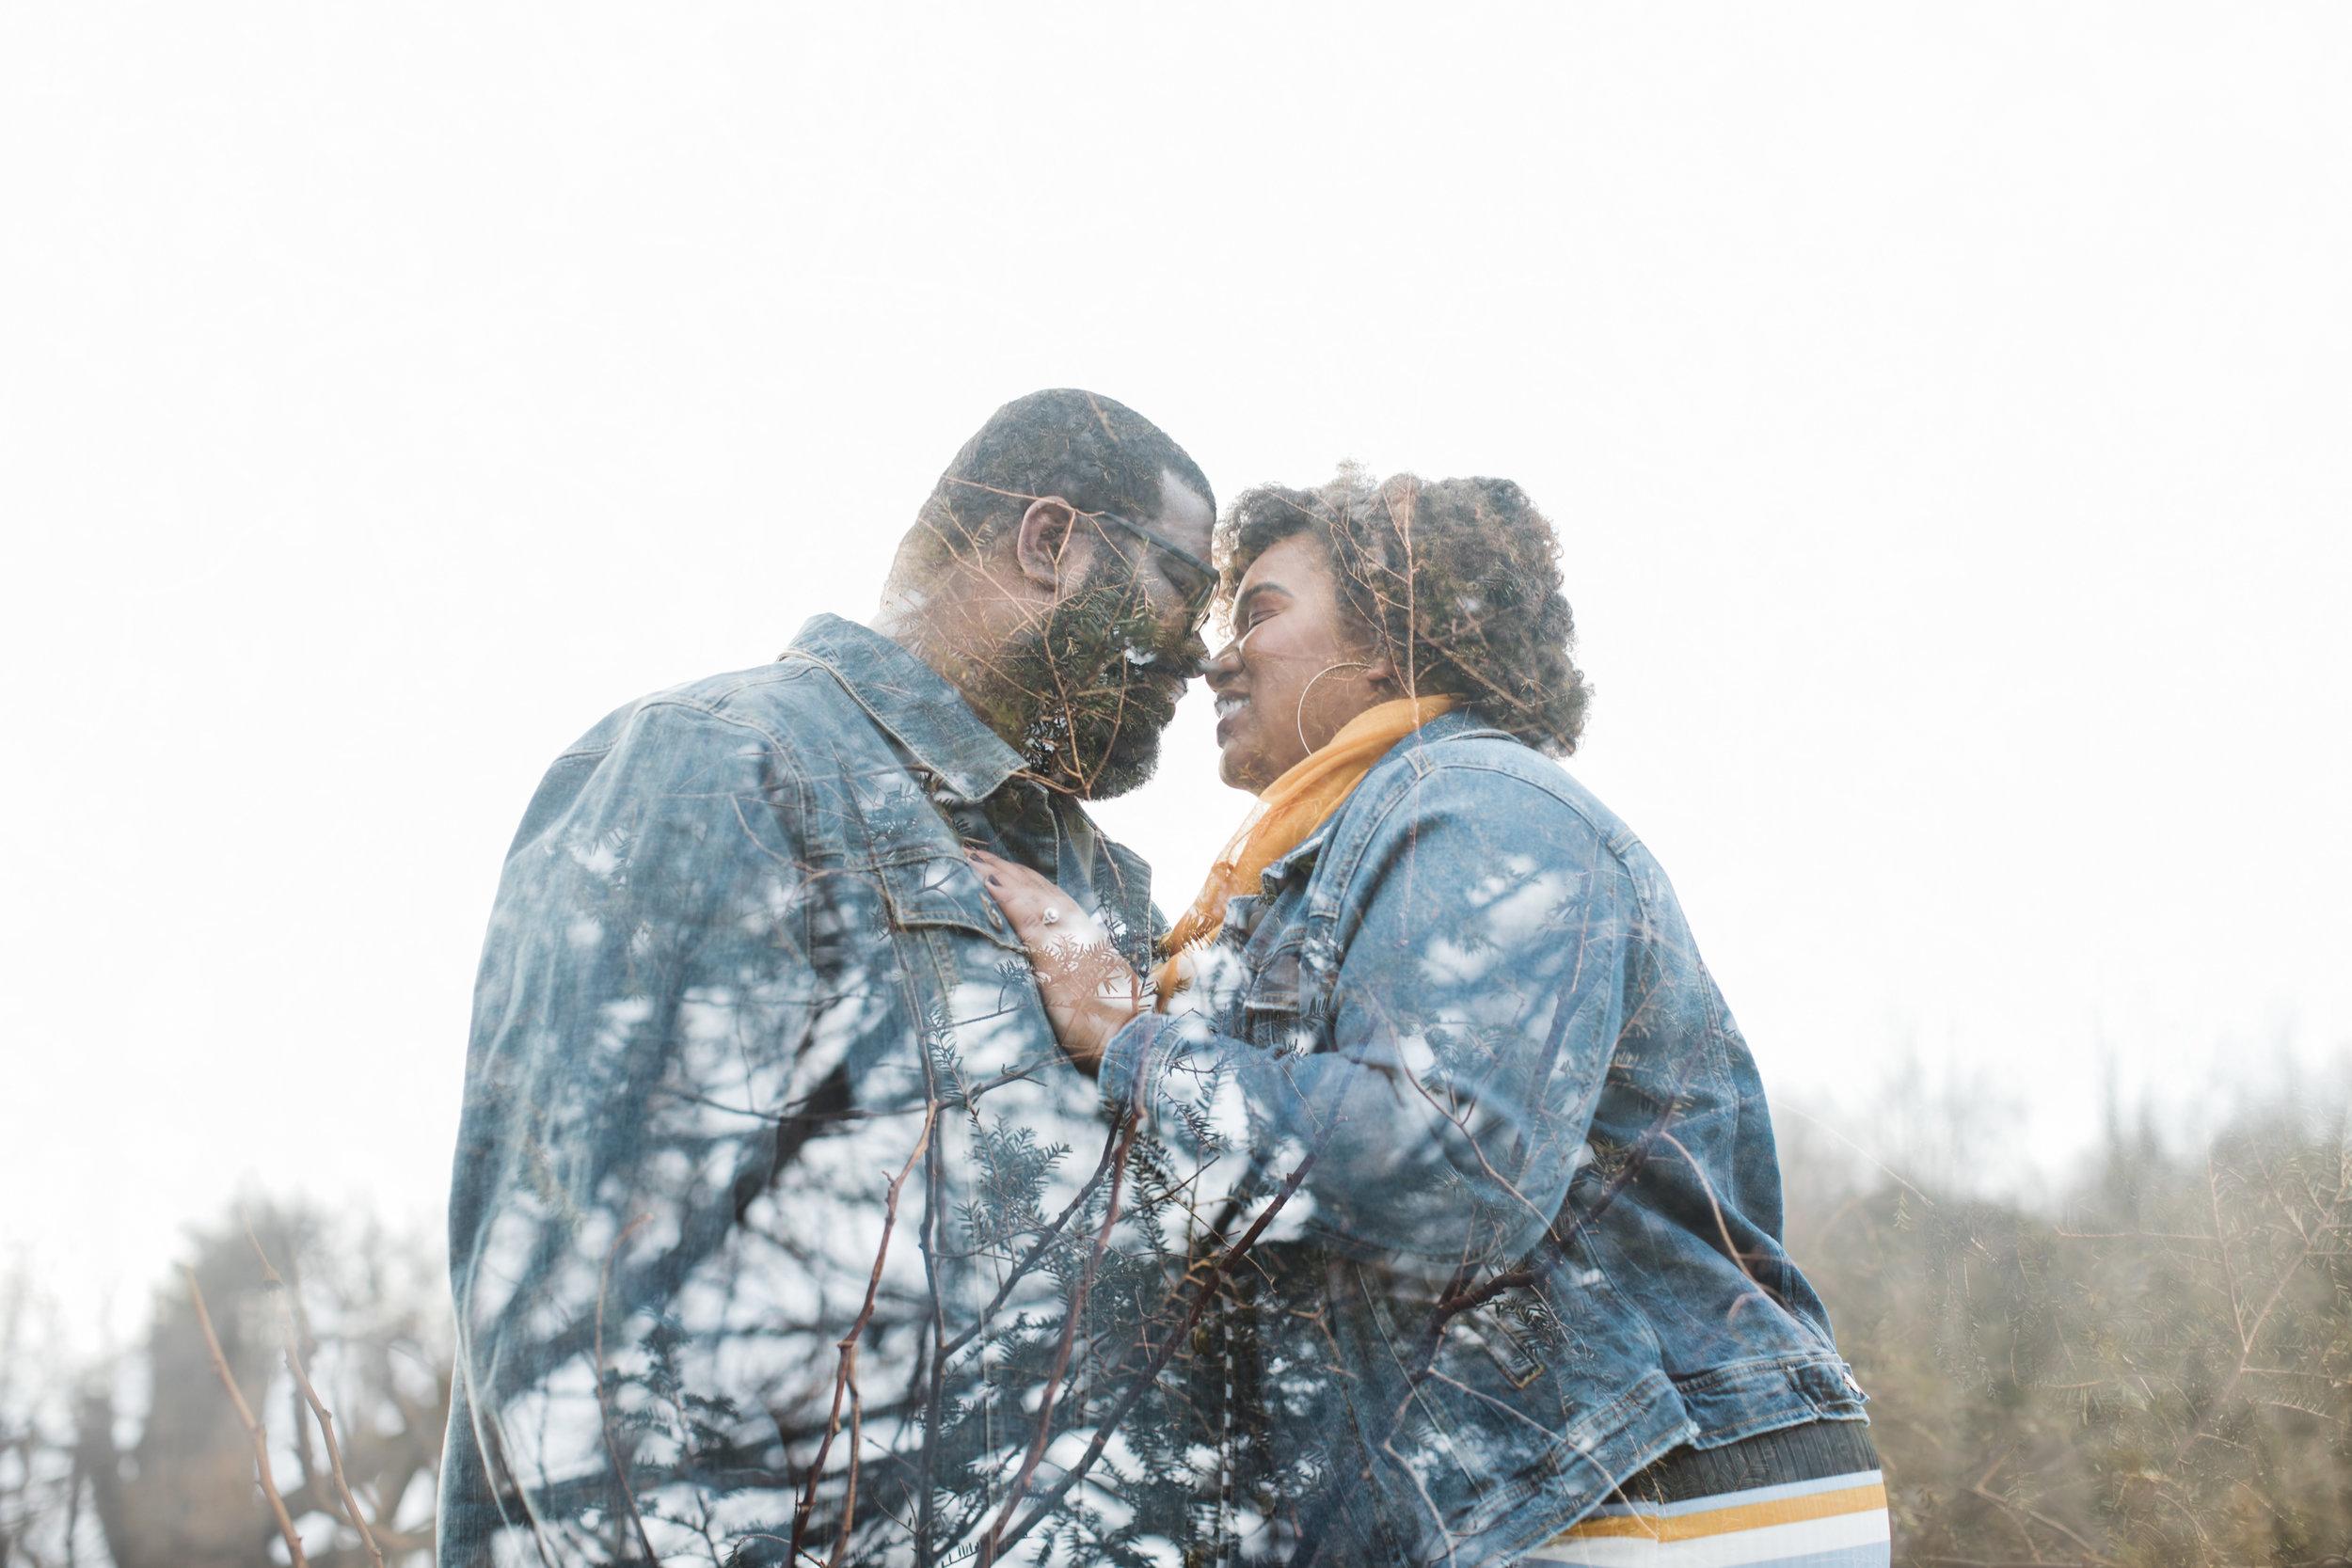 Black Natural Hair Bride Bkack Wedding Photographers Megapixels Media Photography Baltimore Maryland Centennial Park Columbia-39.jpg